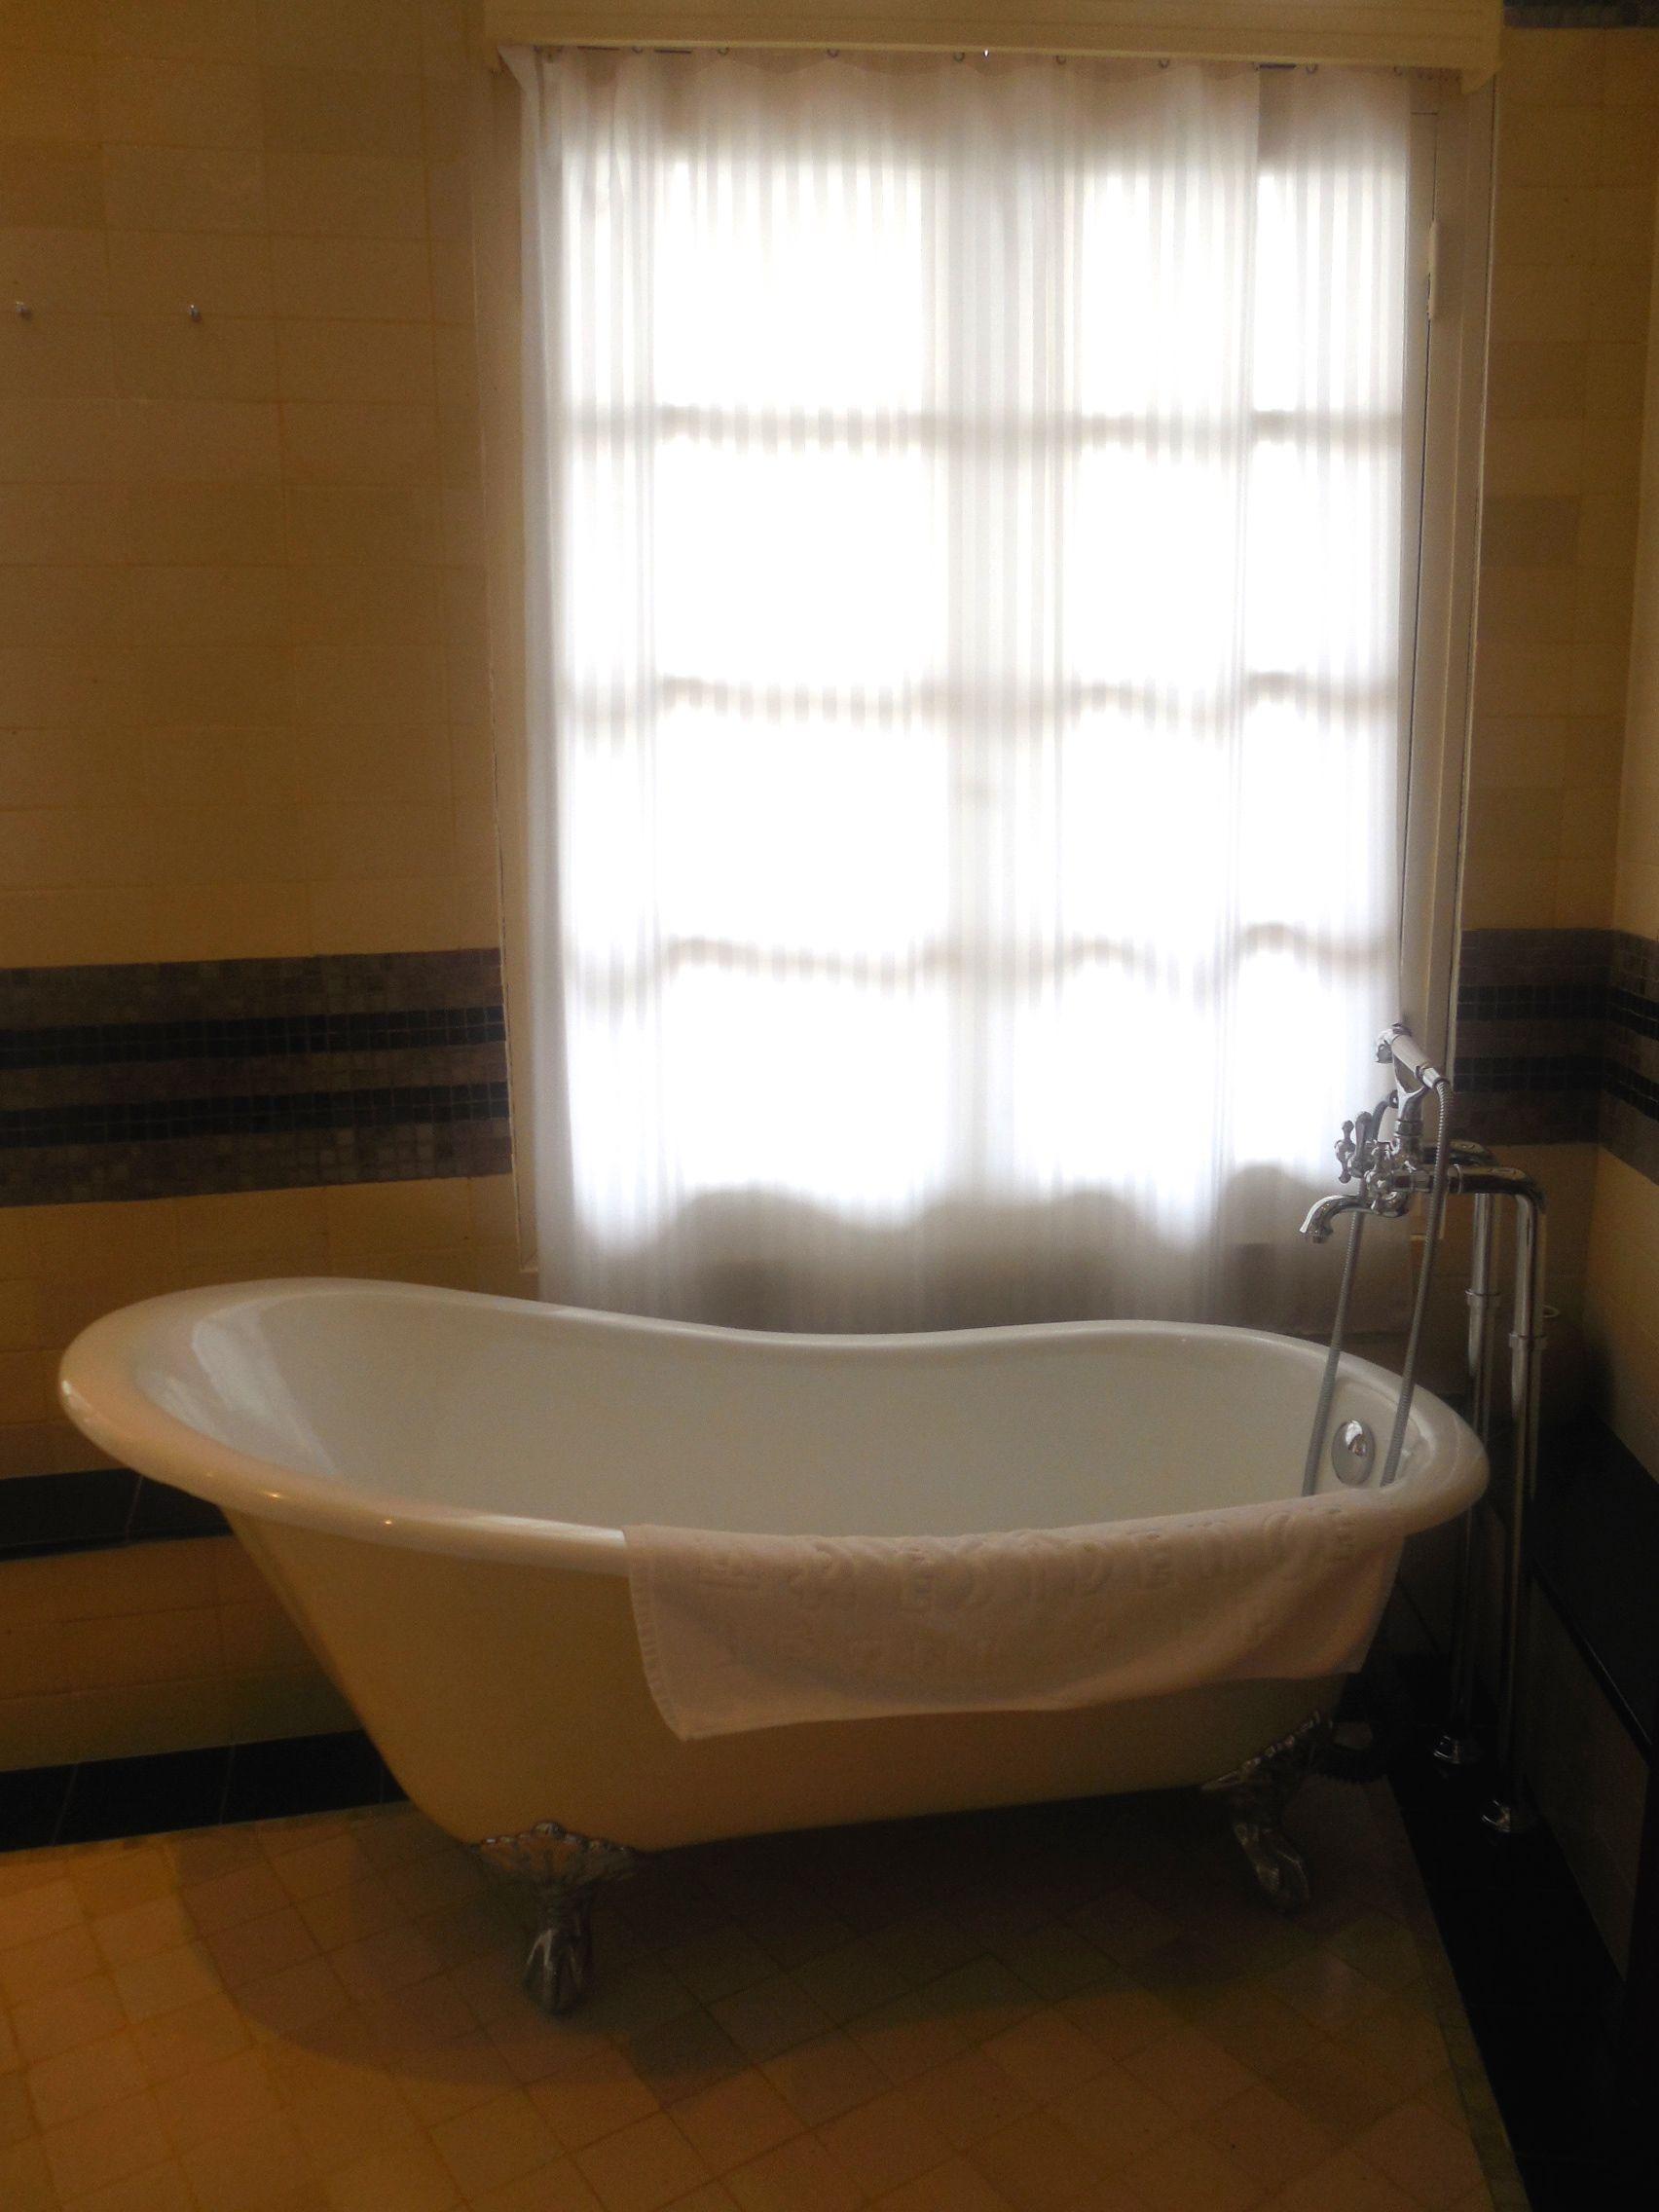 Retro style bathtub | Bathroom ideas | Pinterest | Retro style and ...